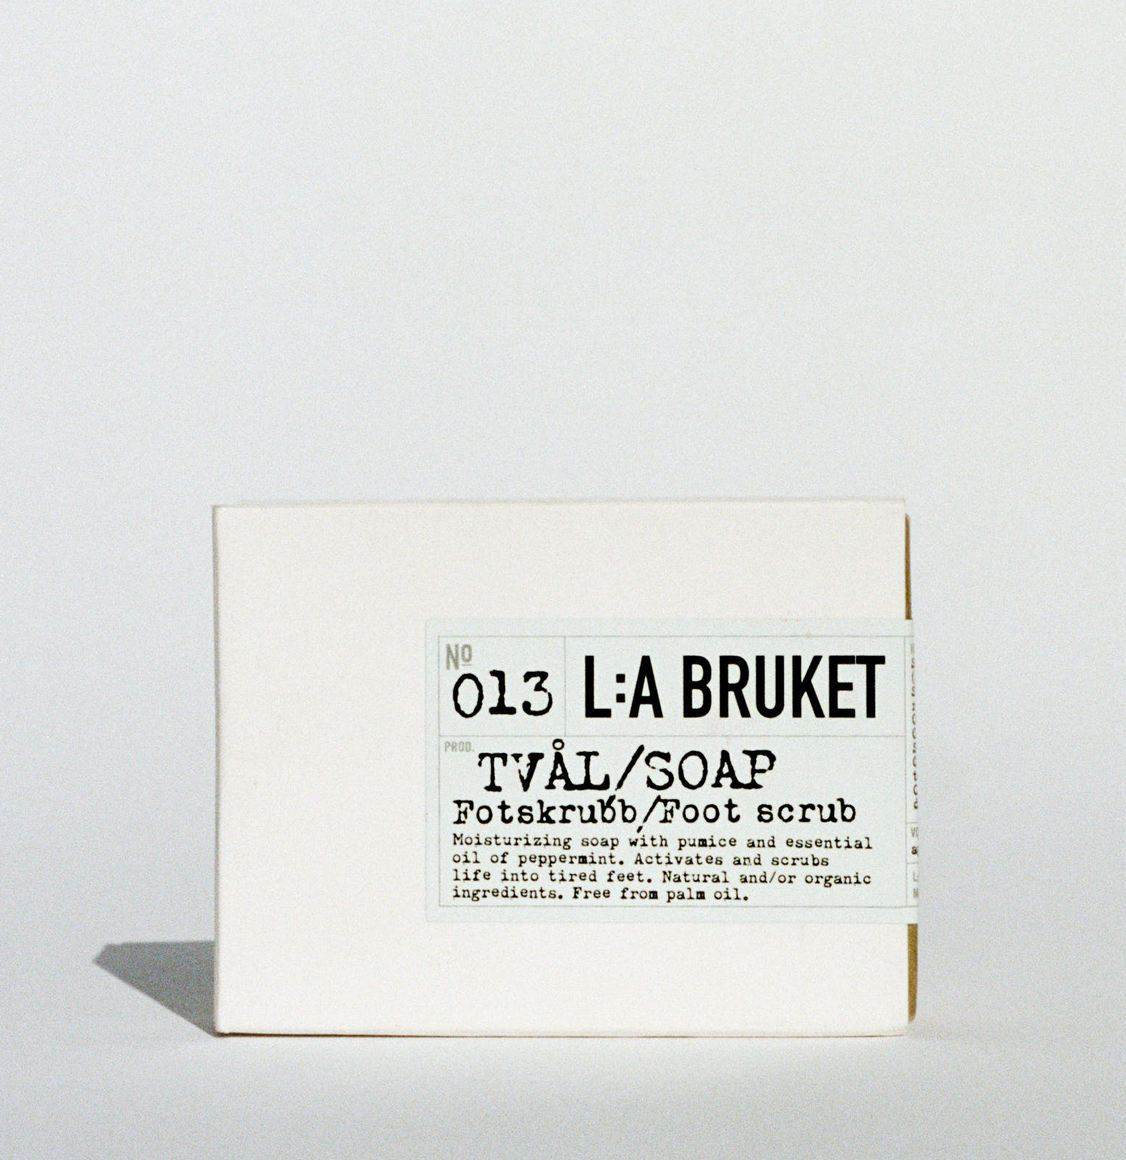 LA Bruket 013 Exfoliating Bar Soap Foot Scrub Peppermint 120g